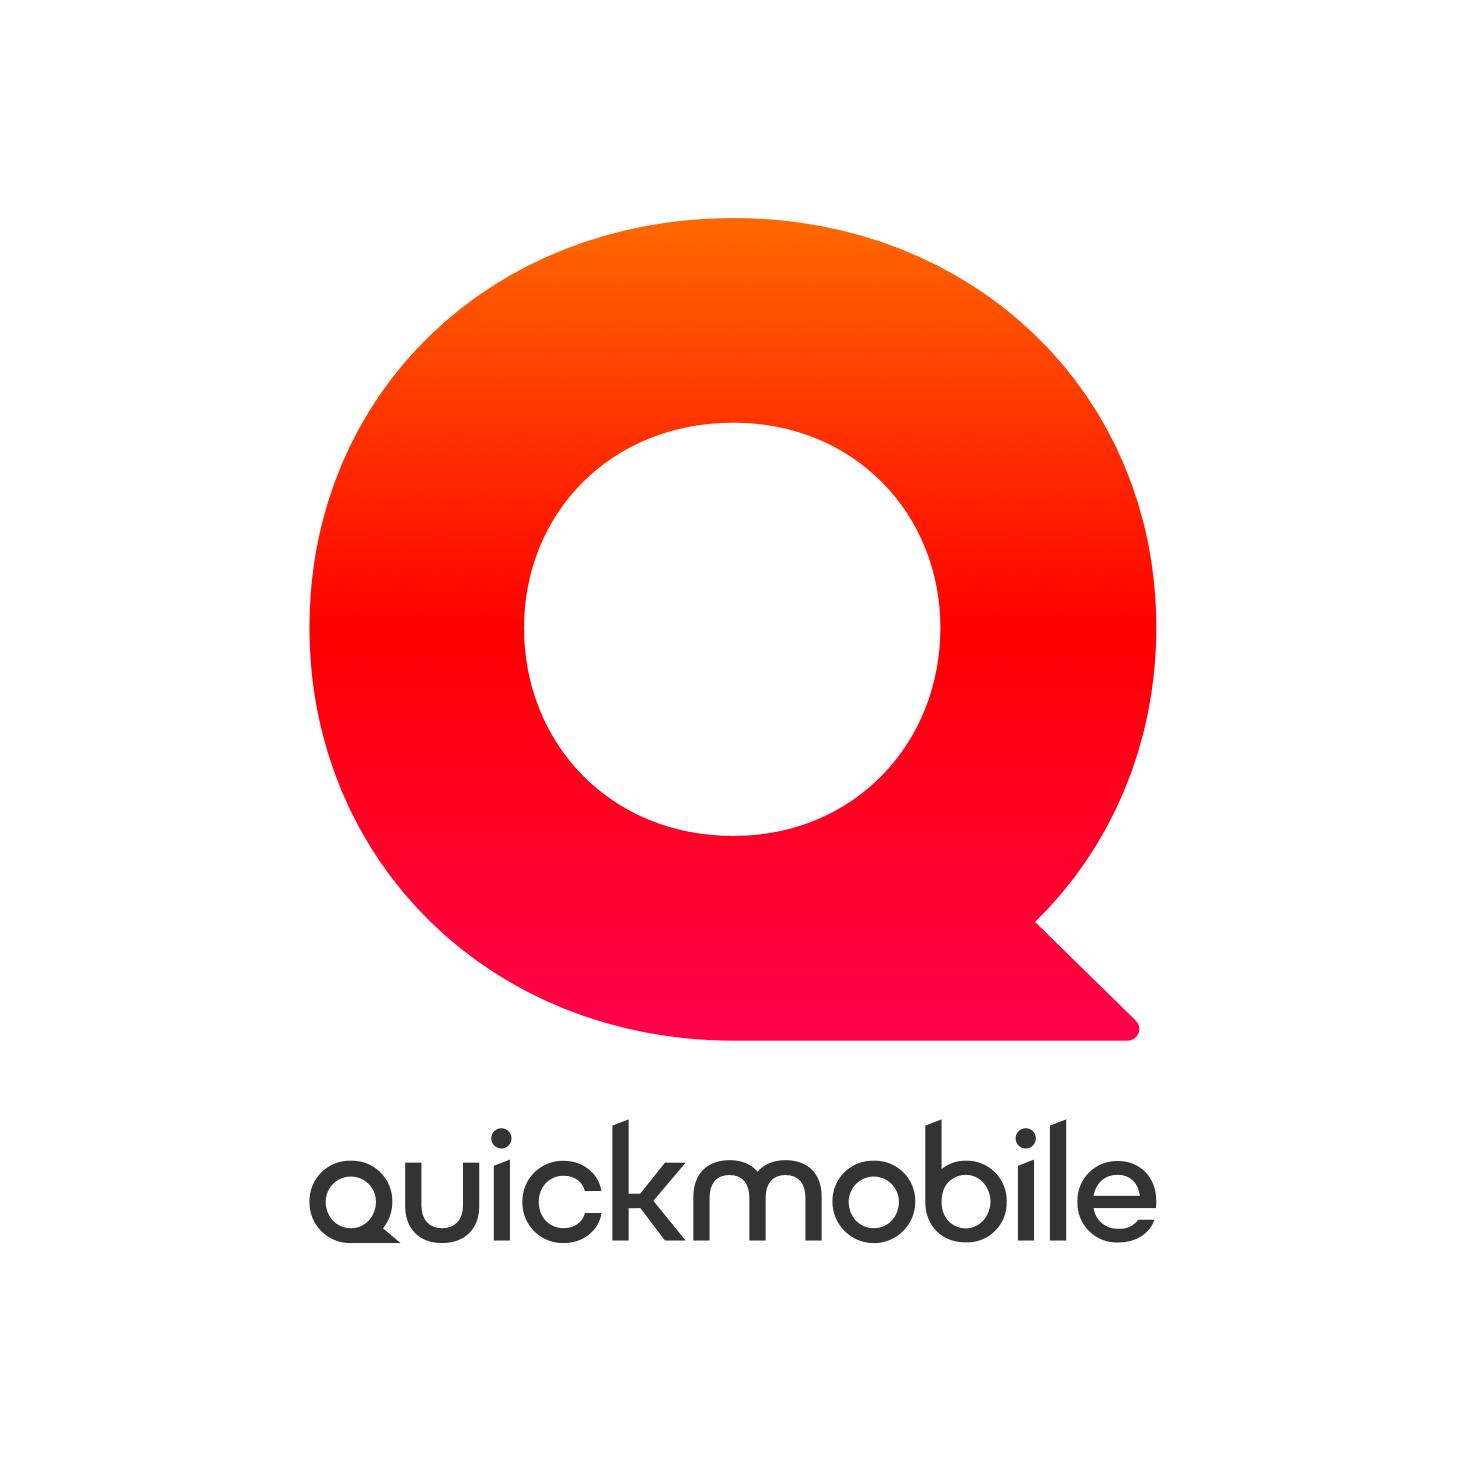 Quickmobile logo.png